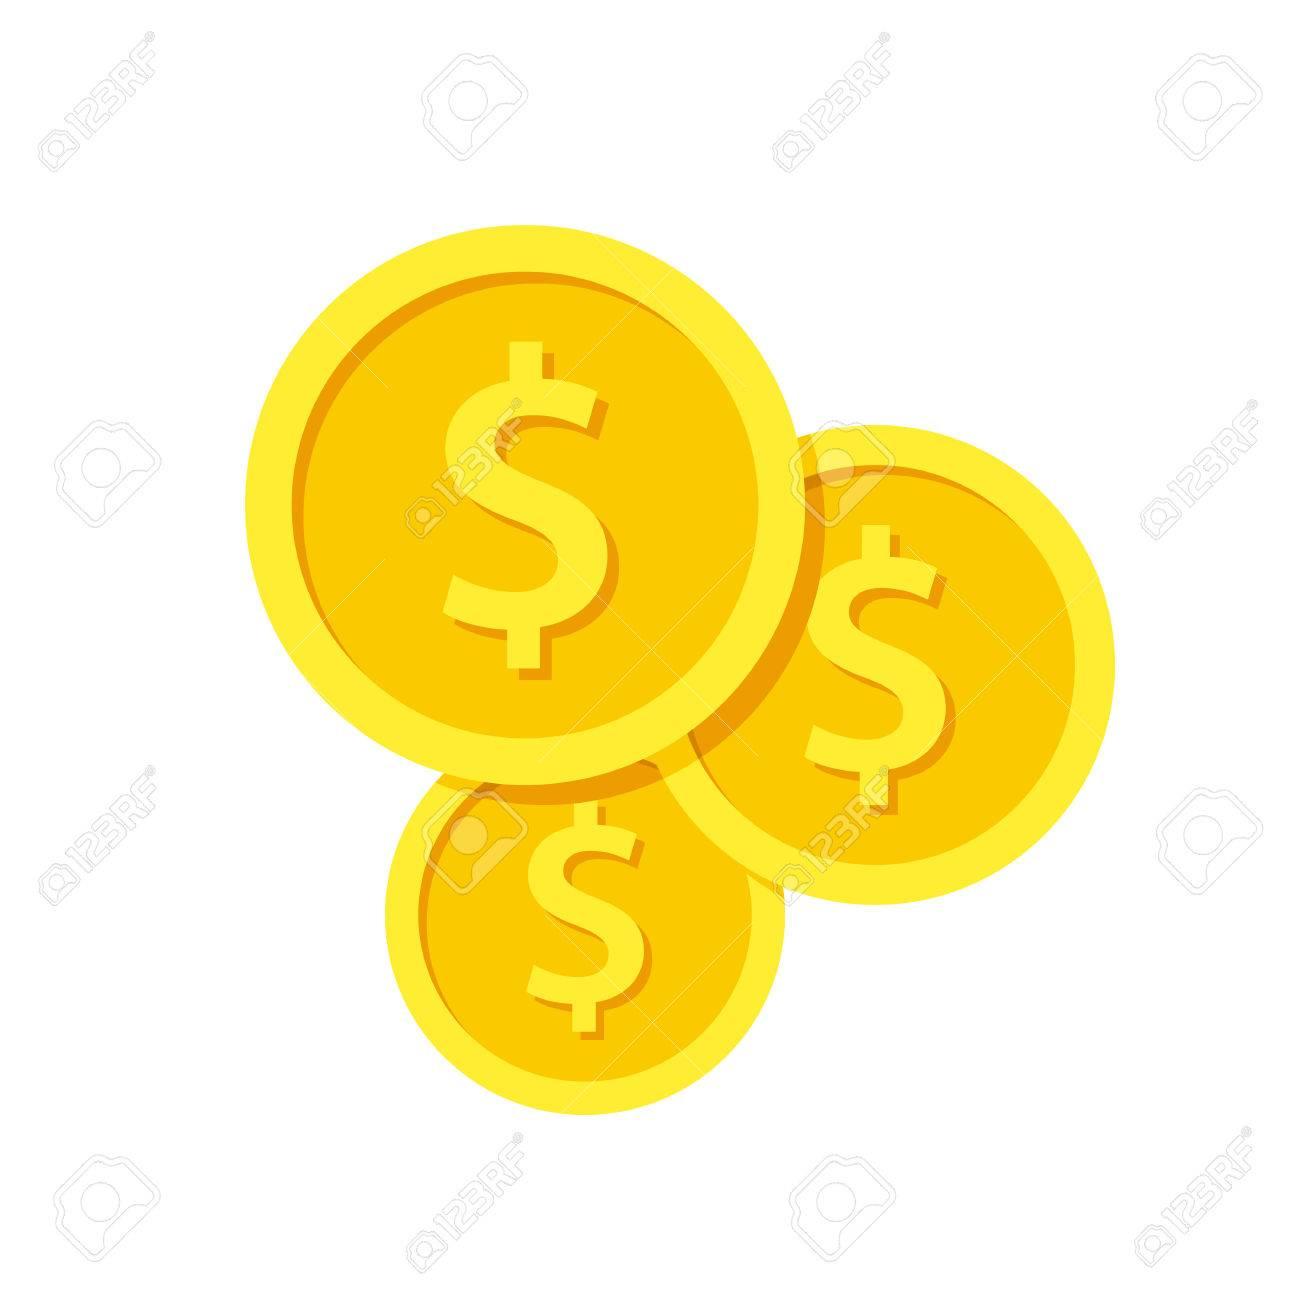 Investment, modern flat icon - 35164939